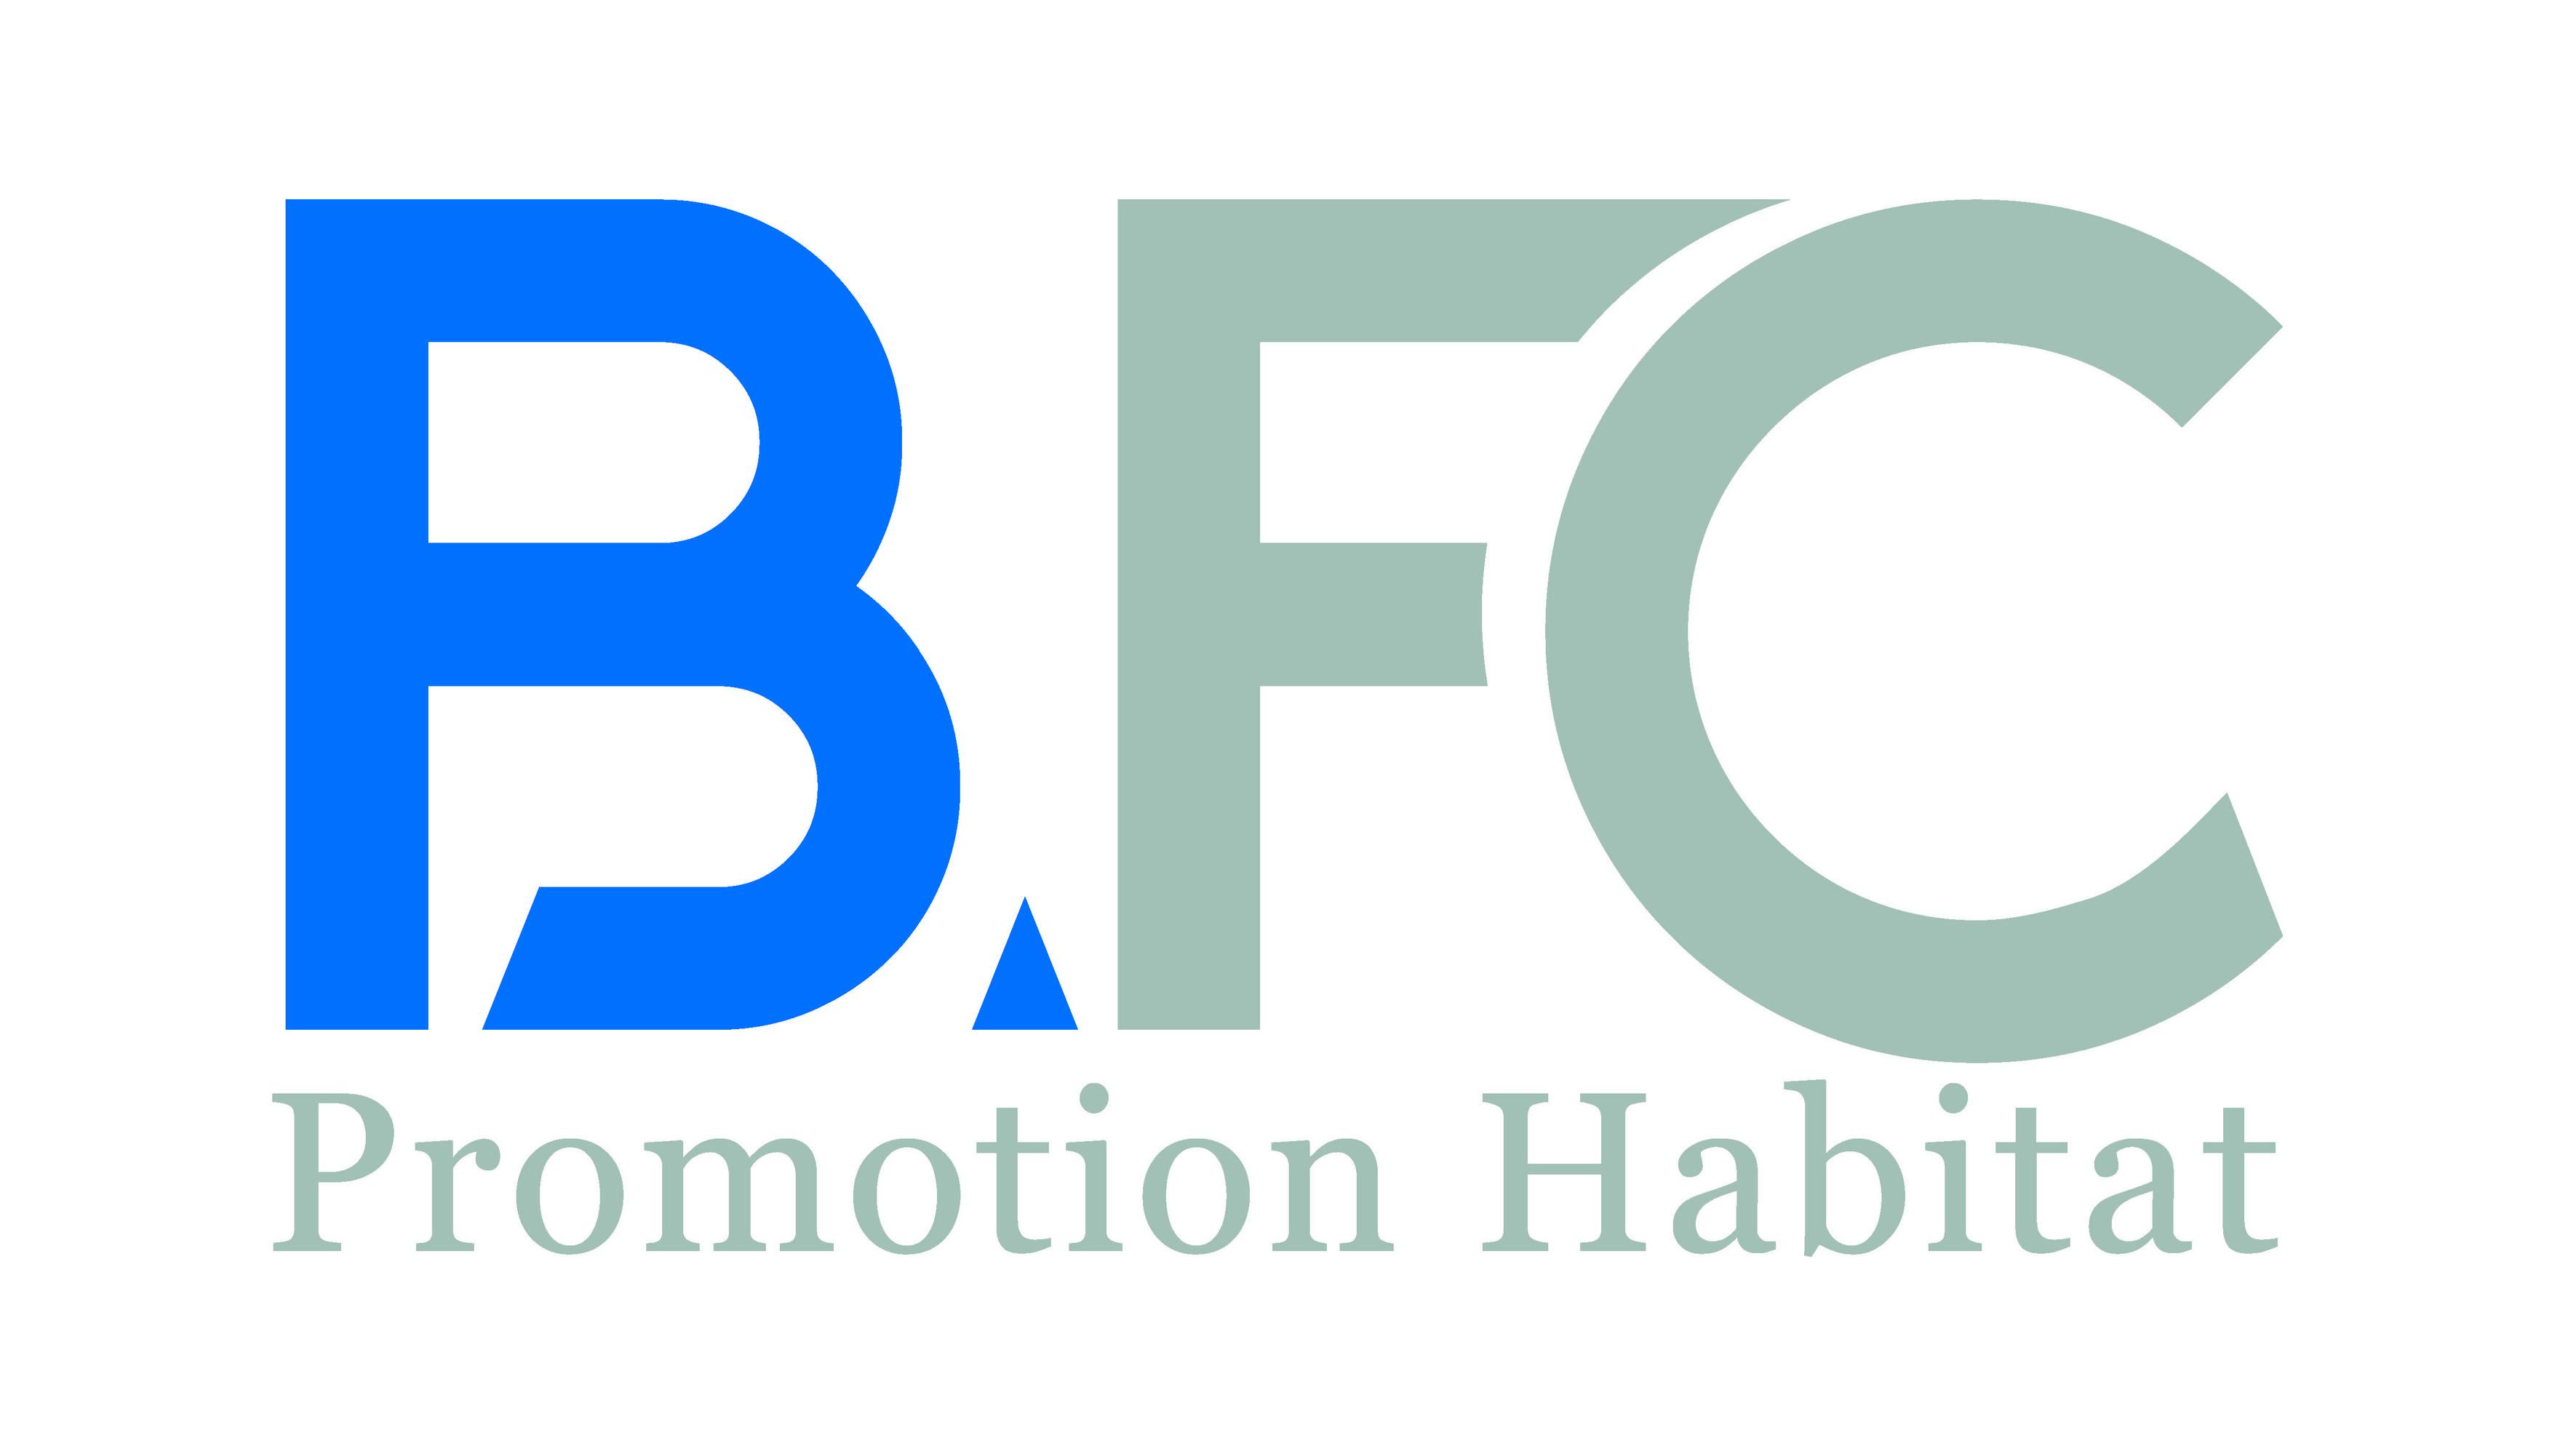 Bfc Promotion Habitat agence immobilière Dijon (21000)